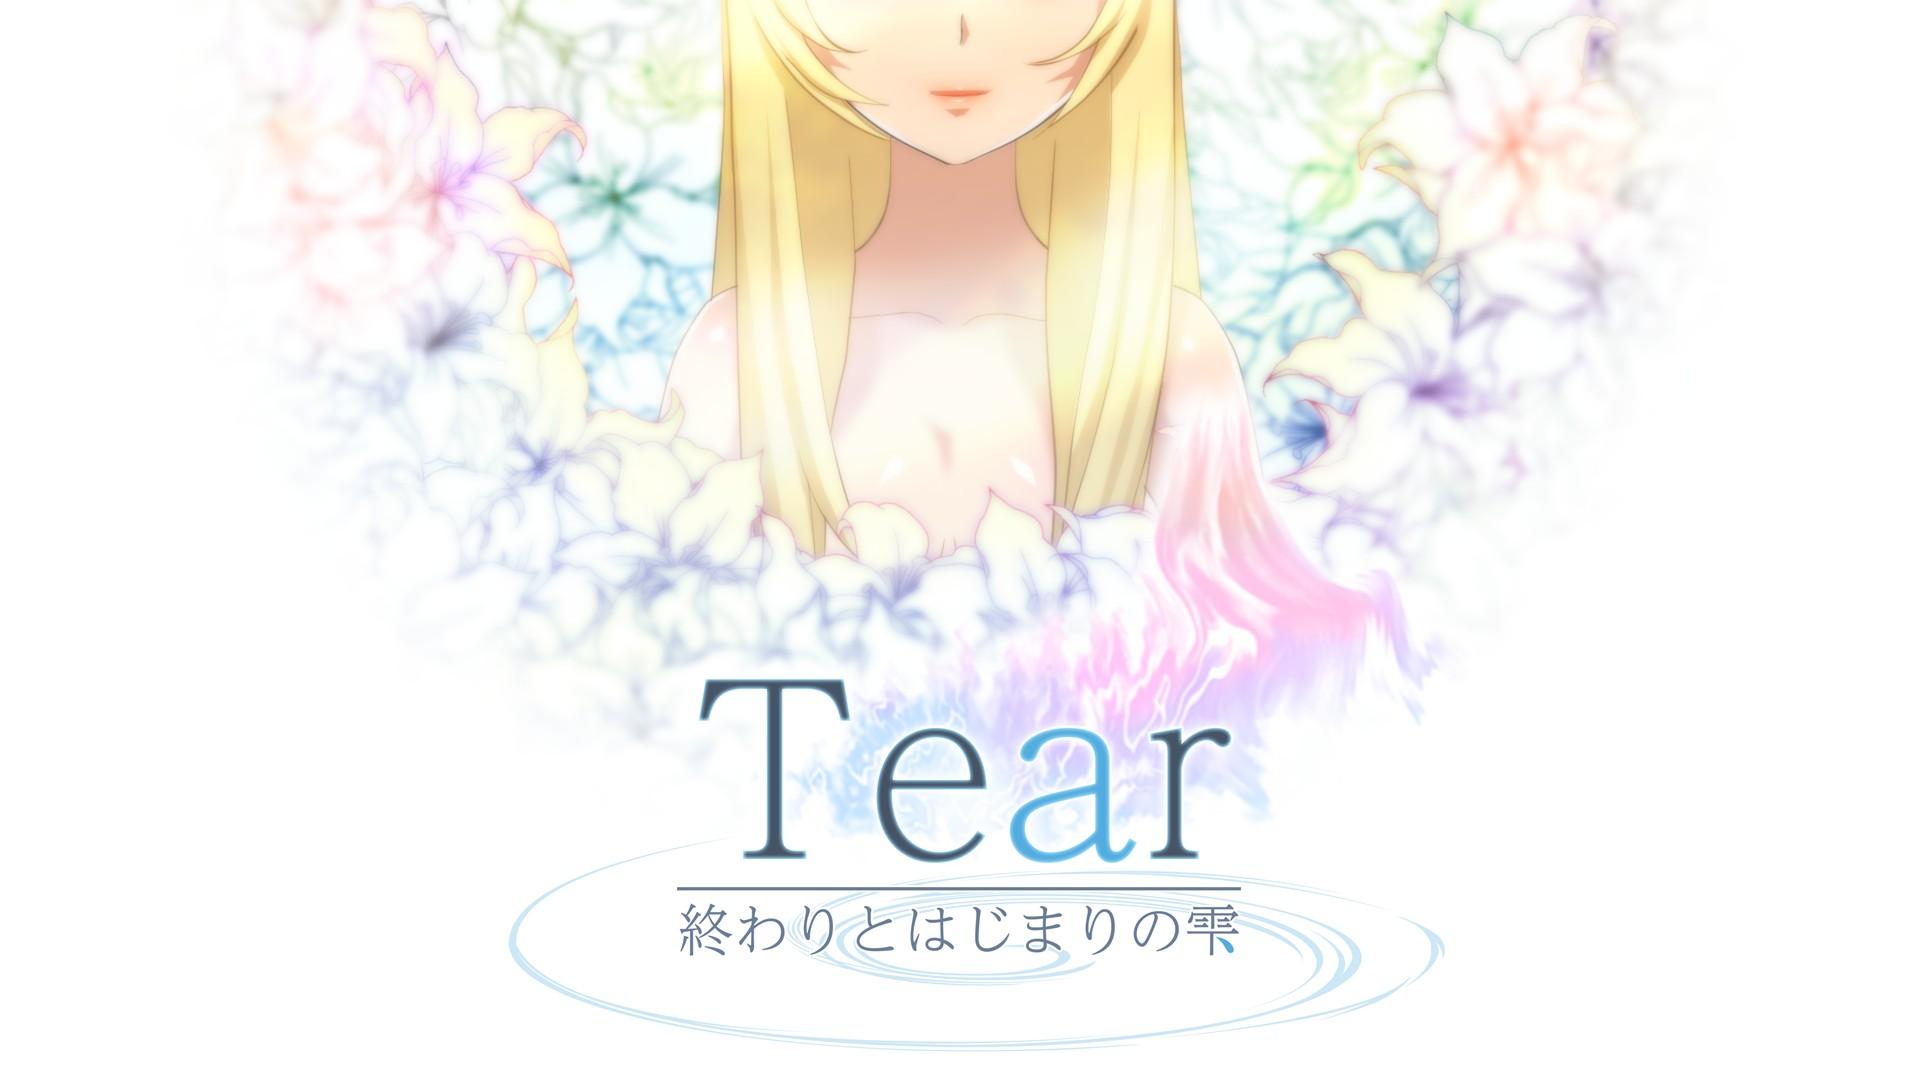 Tear ー終わりとはじまりの雫ー_body_1